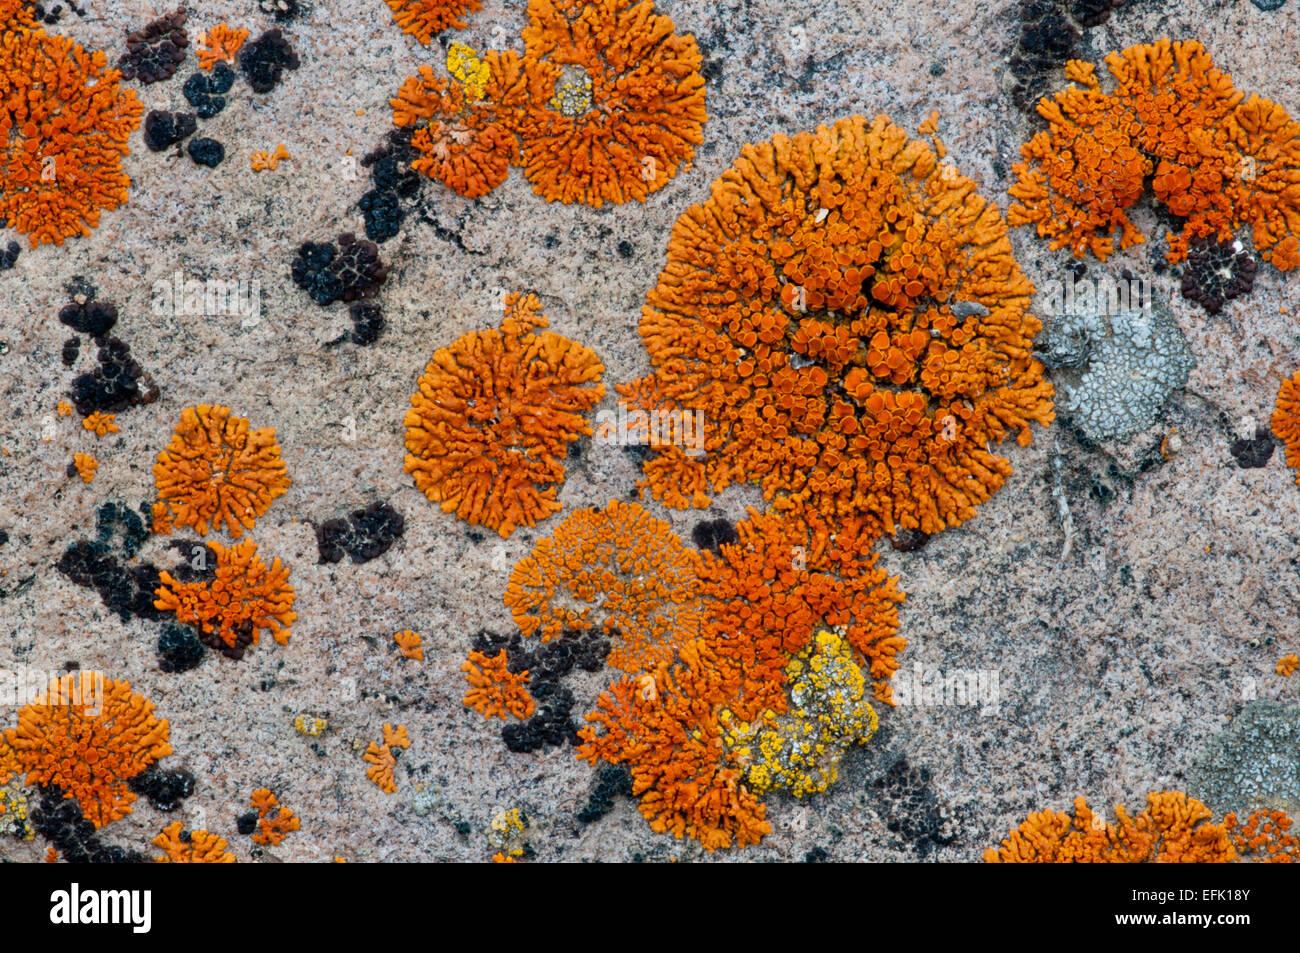 Firedot lichen (Caloplaca sp.) on a granite boulder in the Boulder Mountains, Idaho - Stock Image